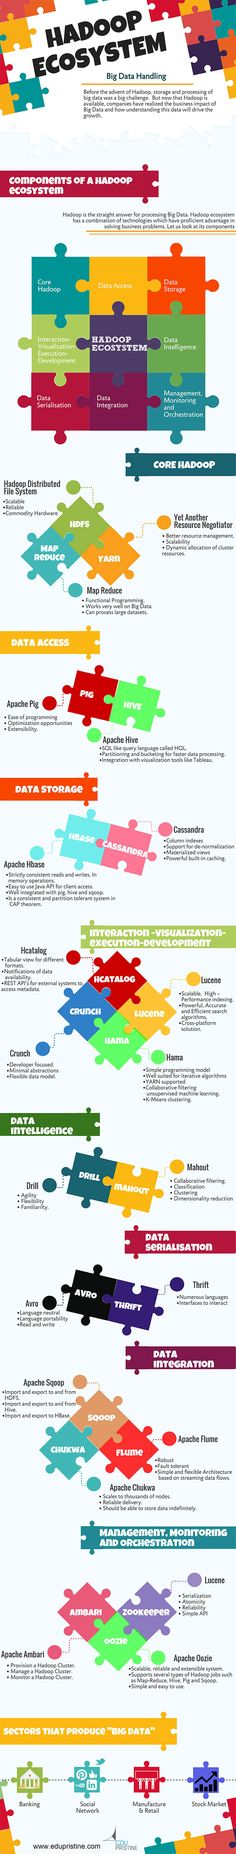 https://social-media-strategy-template.blogspot.com/ Kyvos Insights Inc - Big data Analytics with Olap on Hadoop Technology www.kyvosinsigts.com